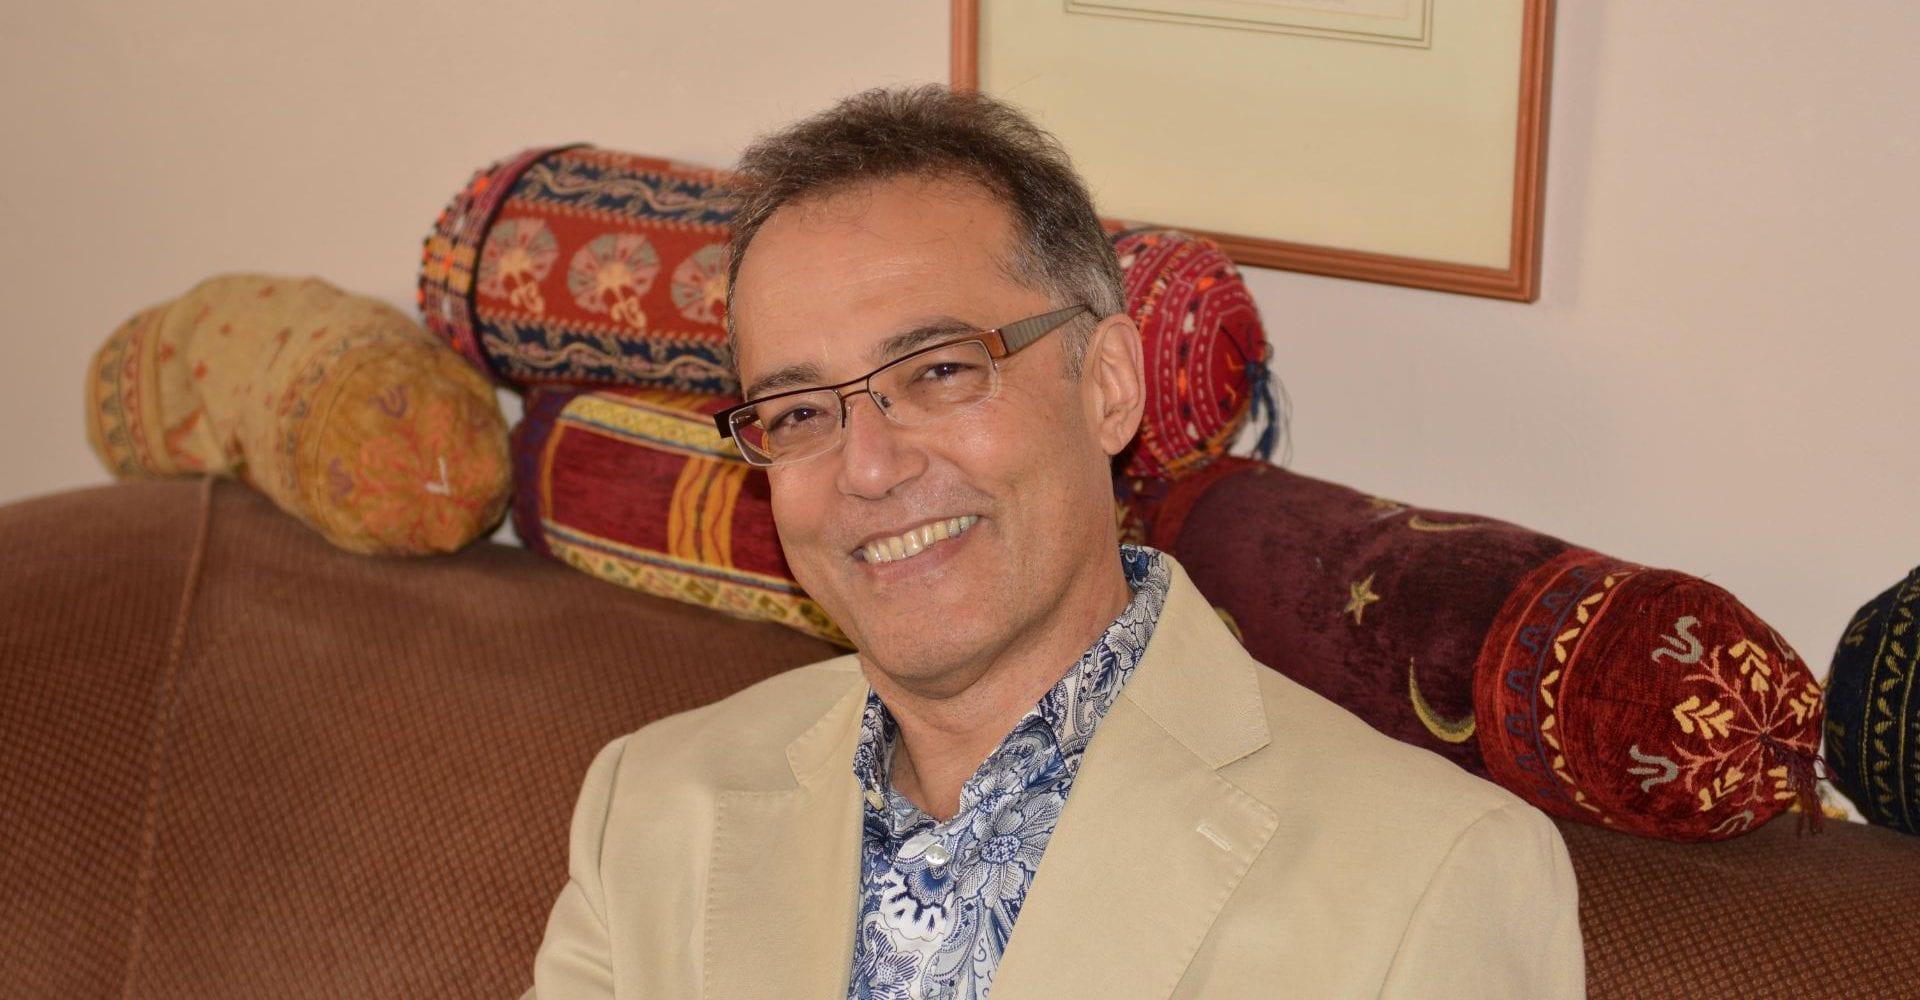 Antonio Sagona, 2011. Photograph © Claudia Sagona